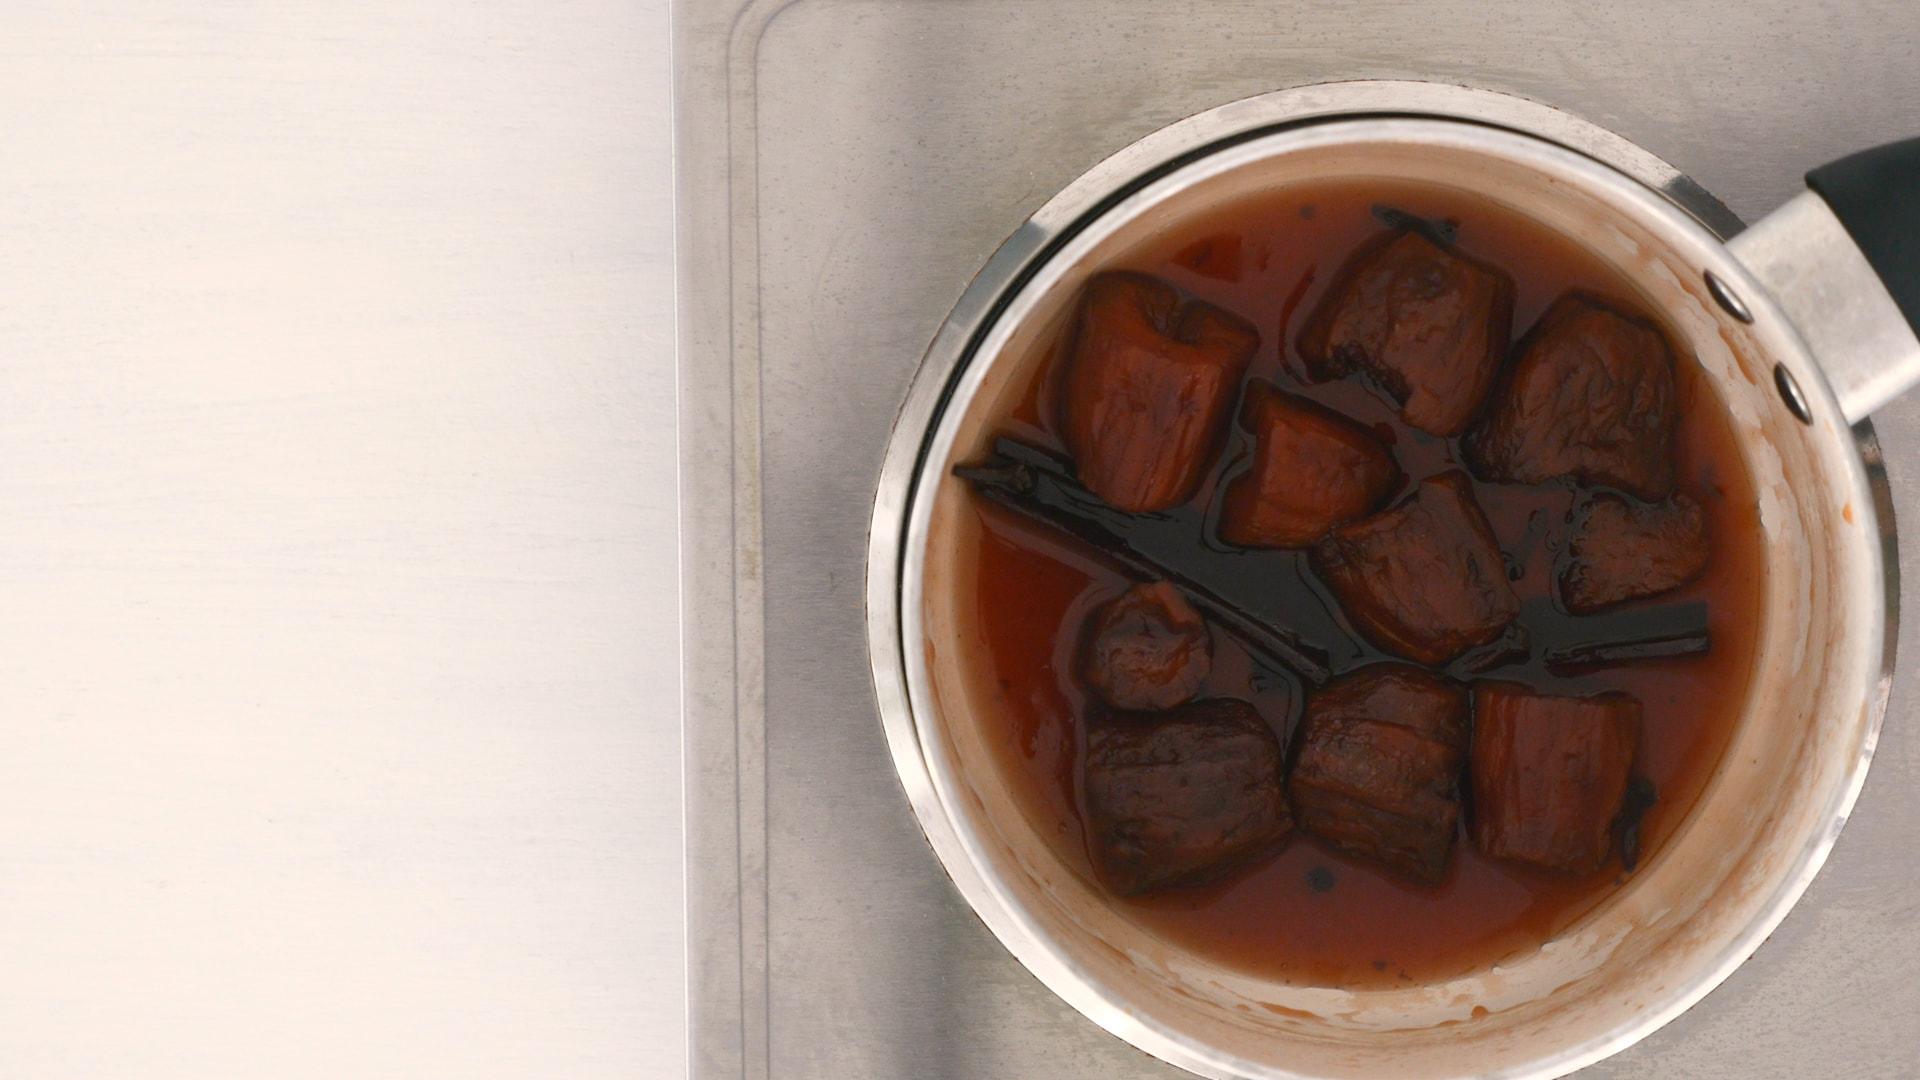 Reducing caramel